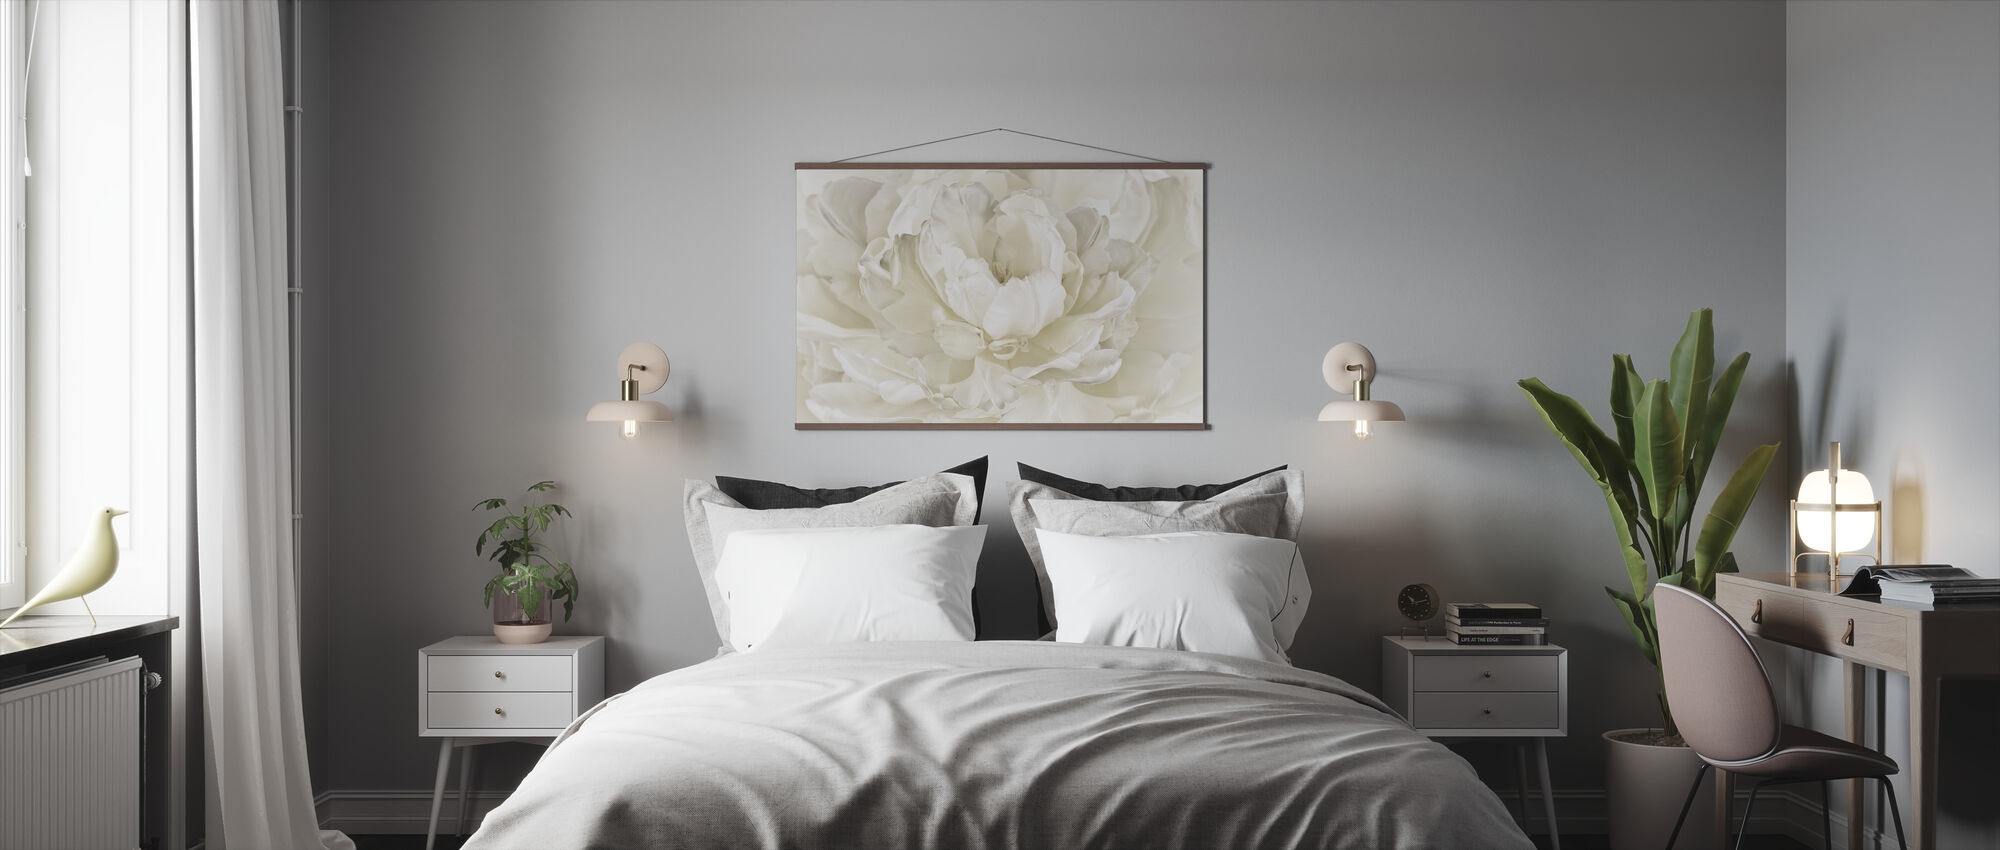 Ivory White Double Tulip - Poster - Bedroom